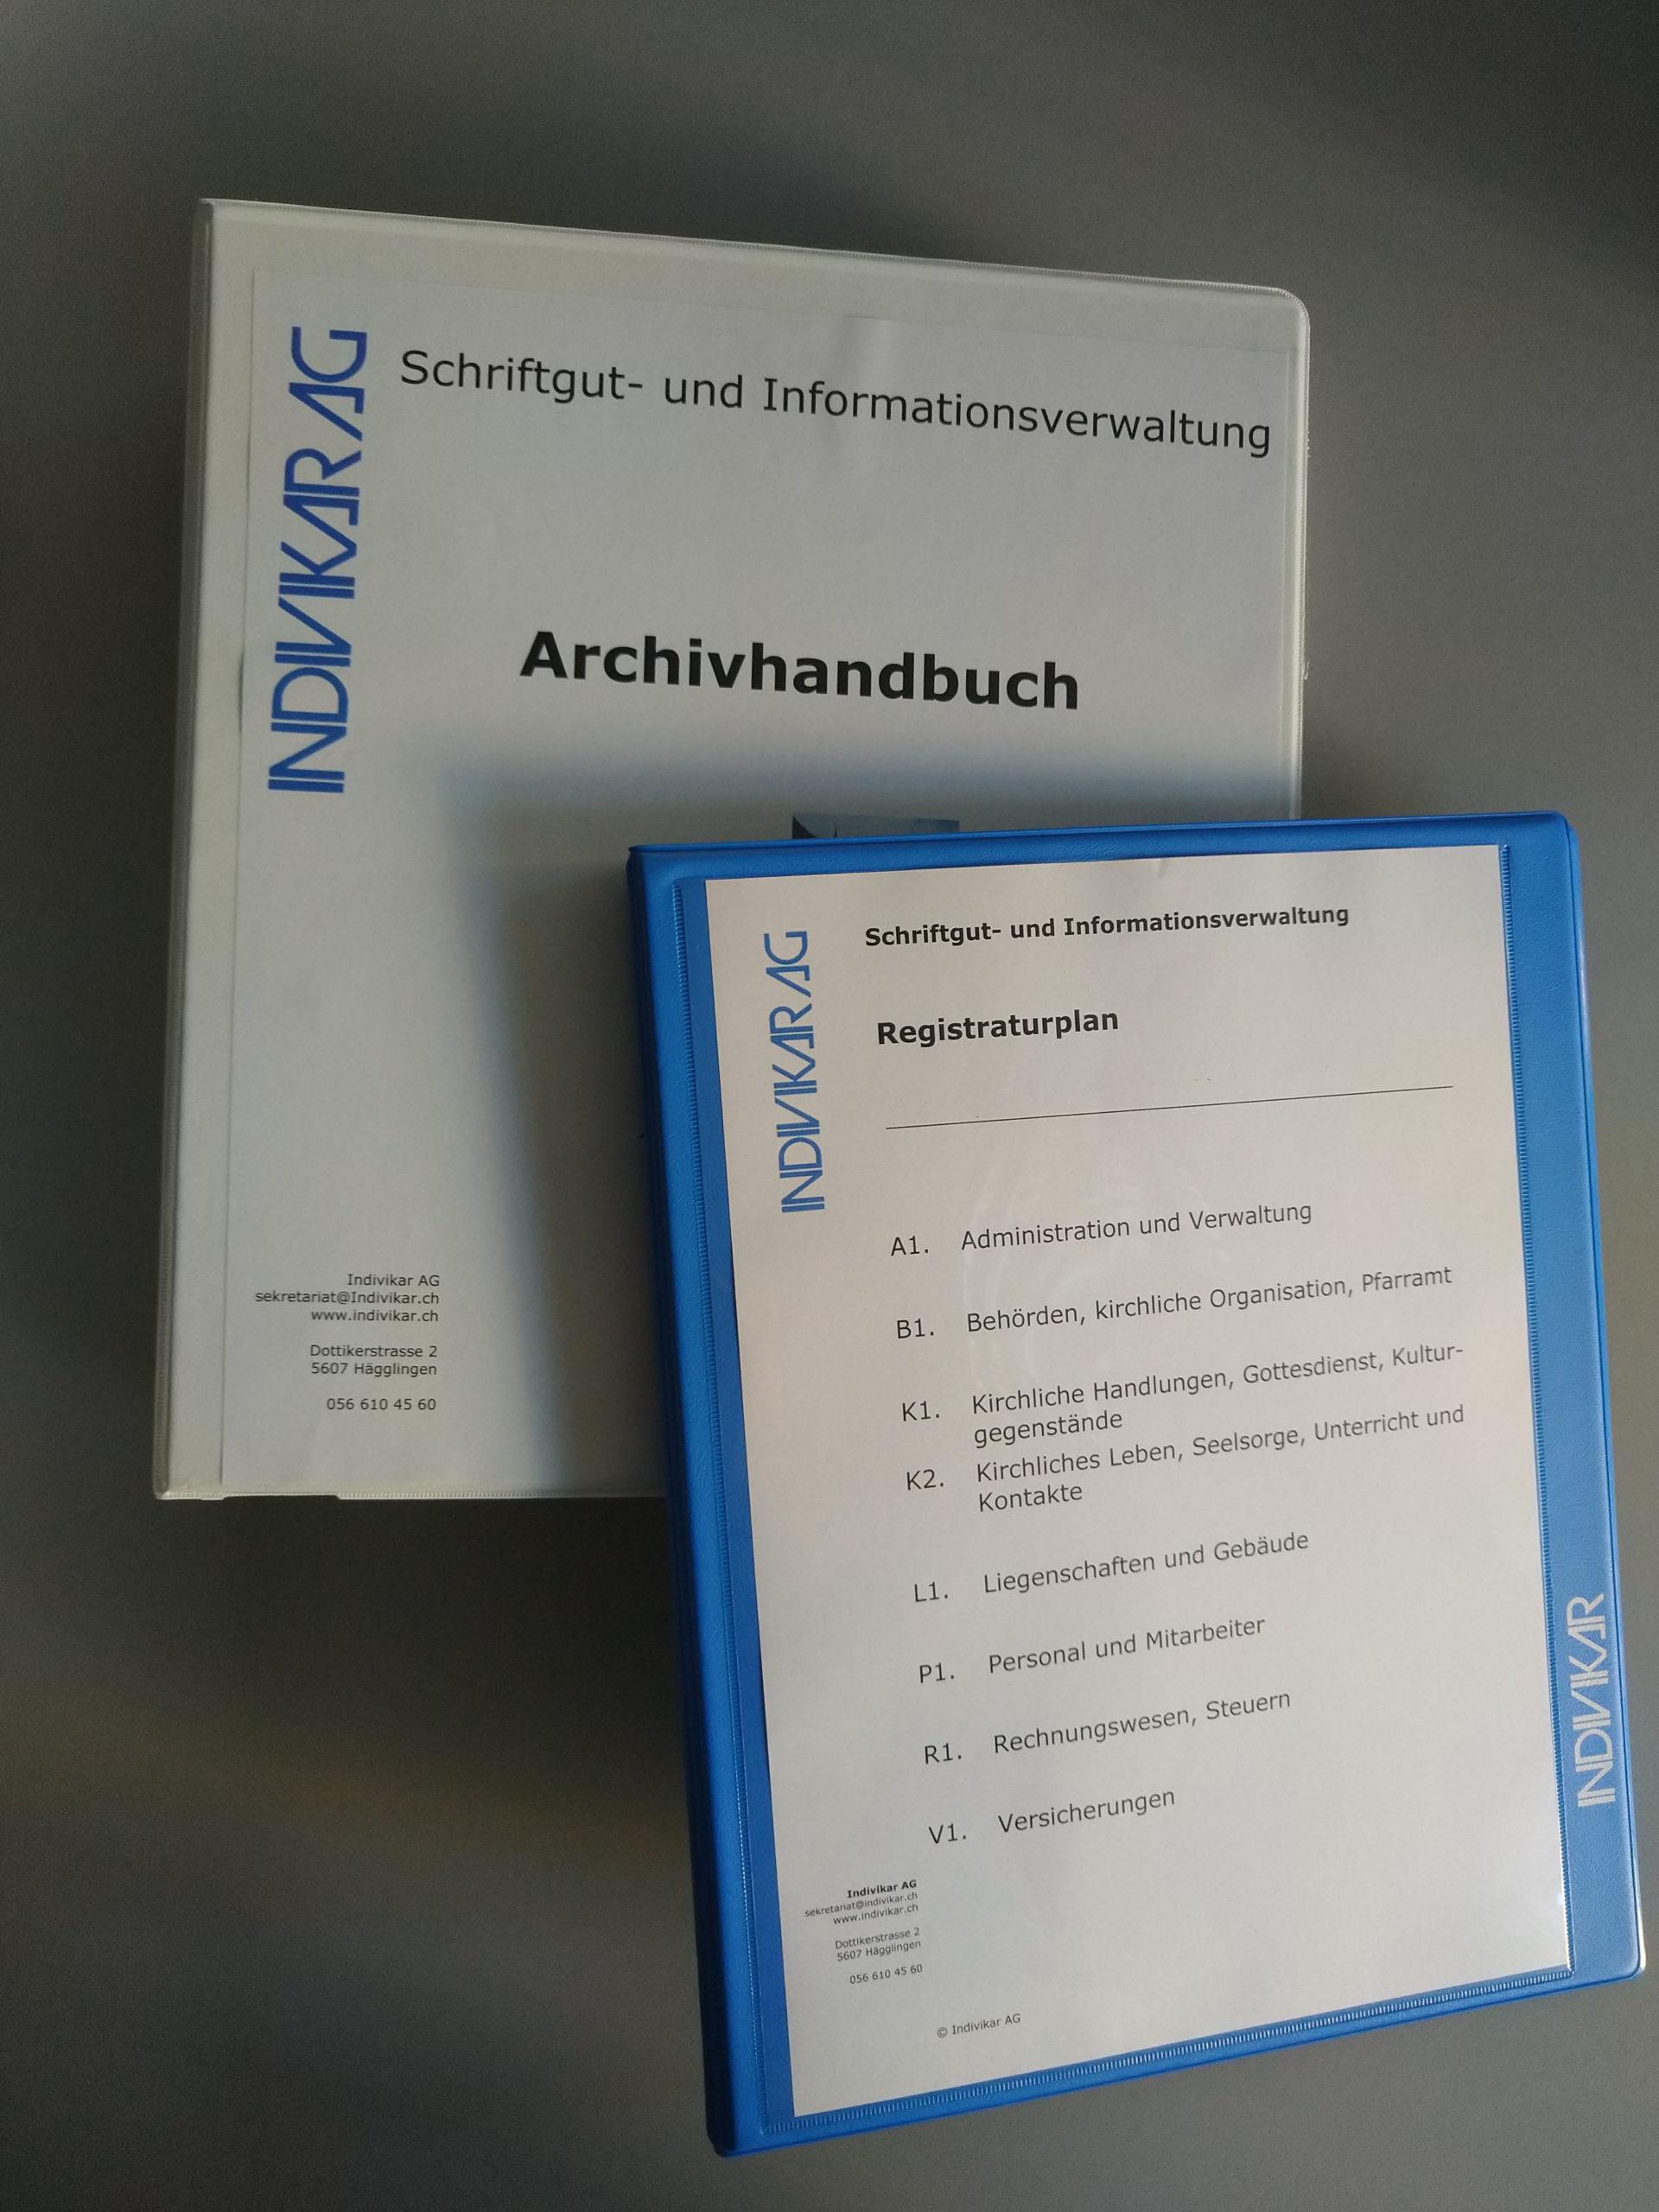 Registraturplan & Archivhandbuch